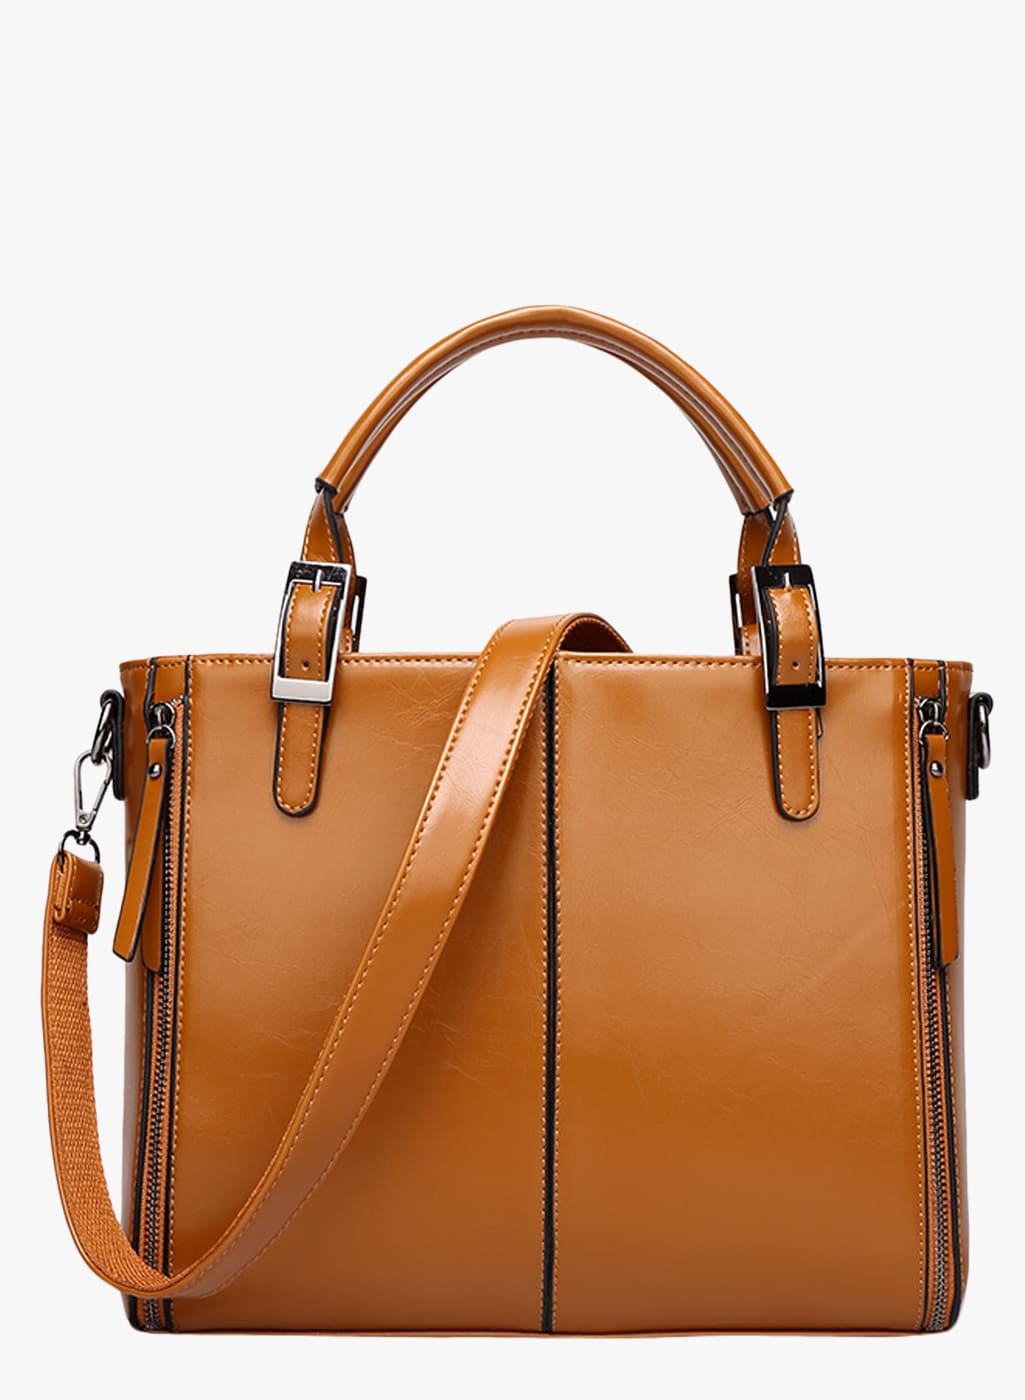 d1207acf4252 Handbags for Women - Buy Leather Handbags